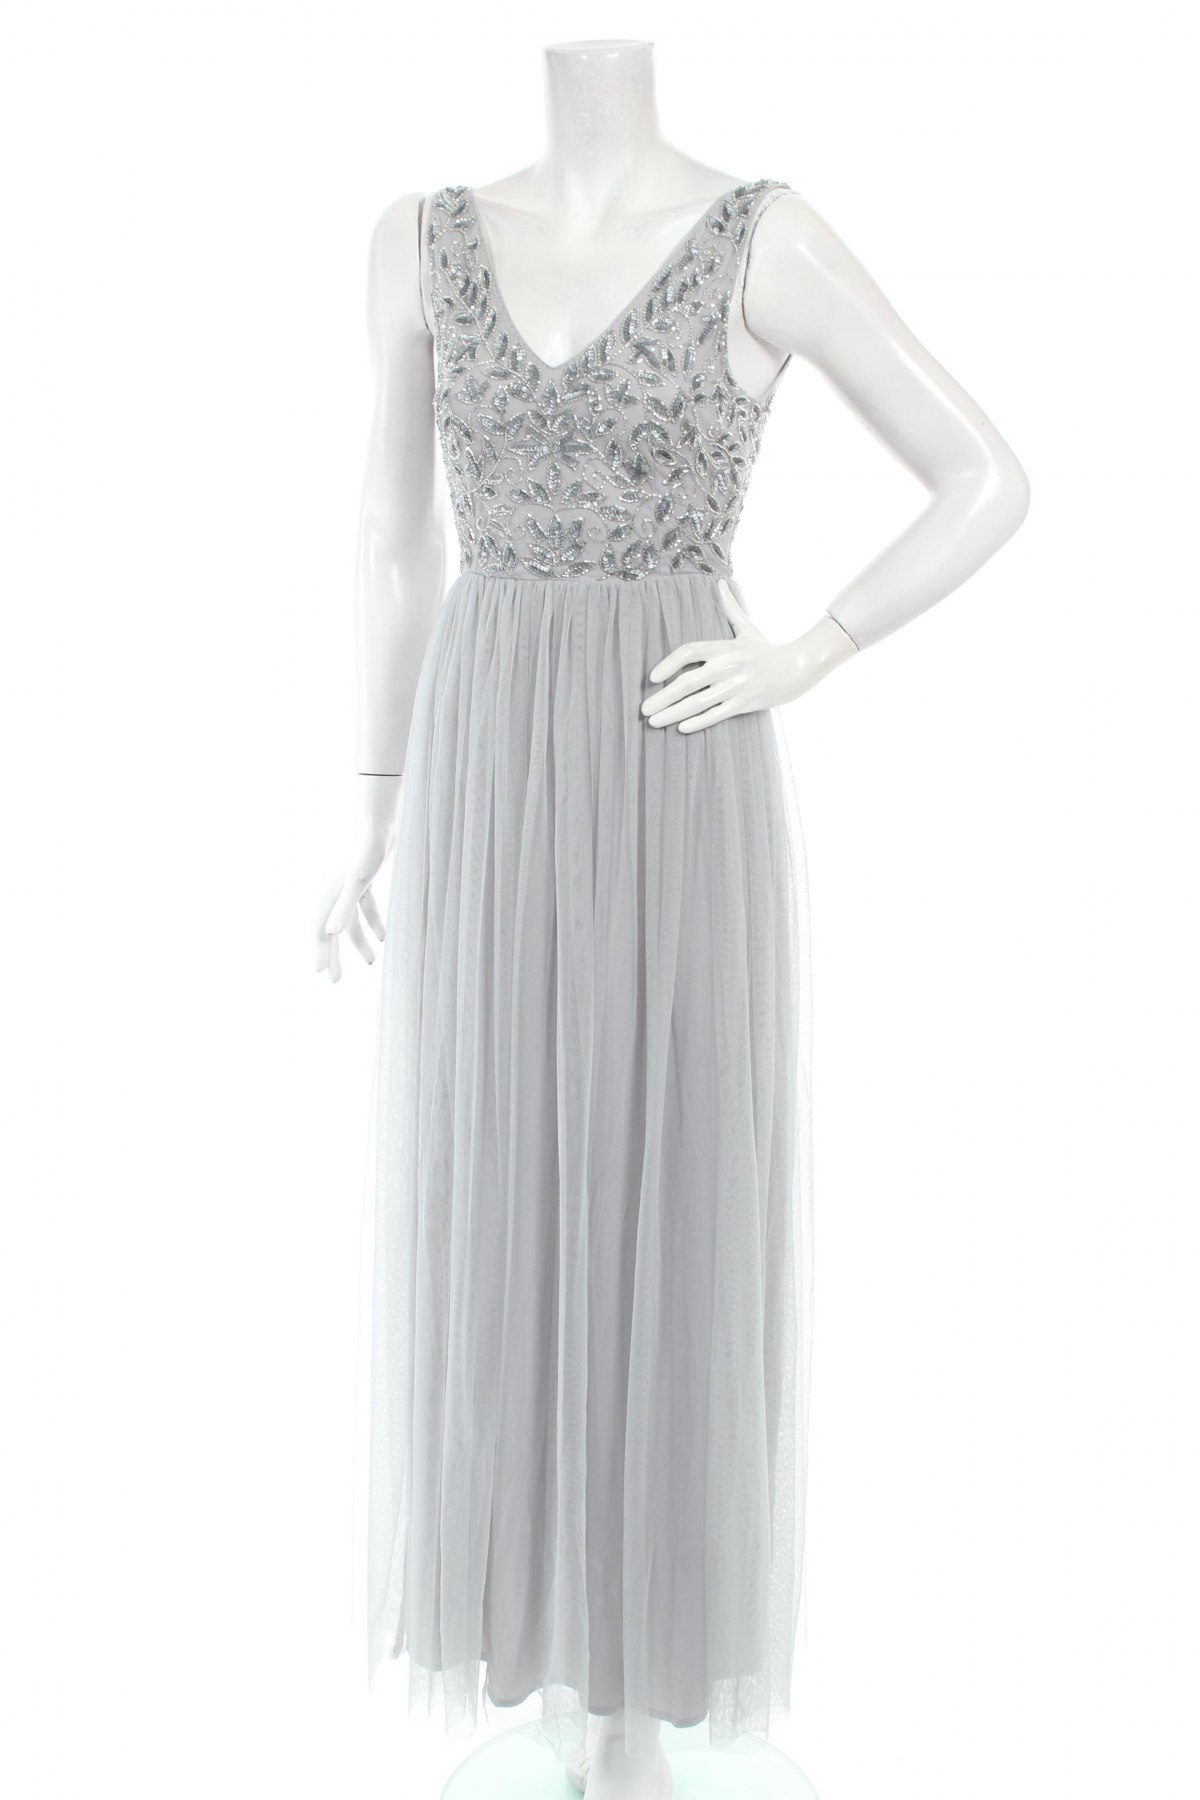 80ef4bf87444 Φόρεμα Lace   Beads - σε συμφέρουσα τιμή στο Remix -  103544300